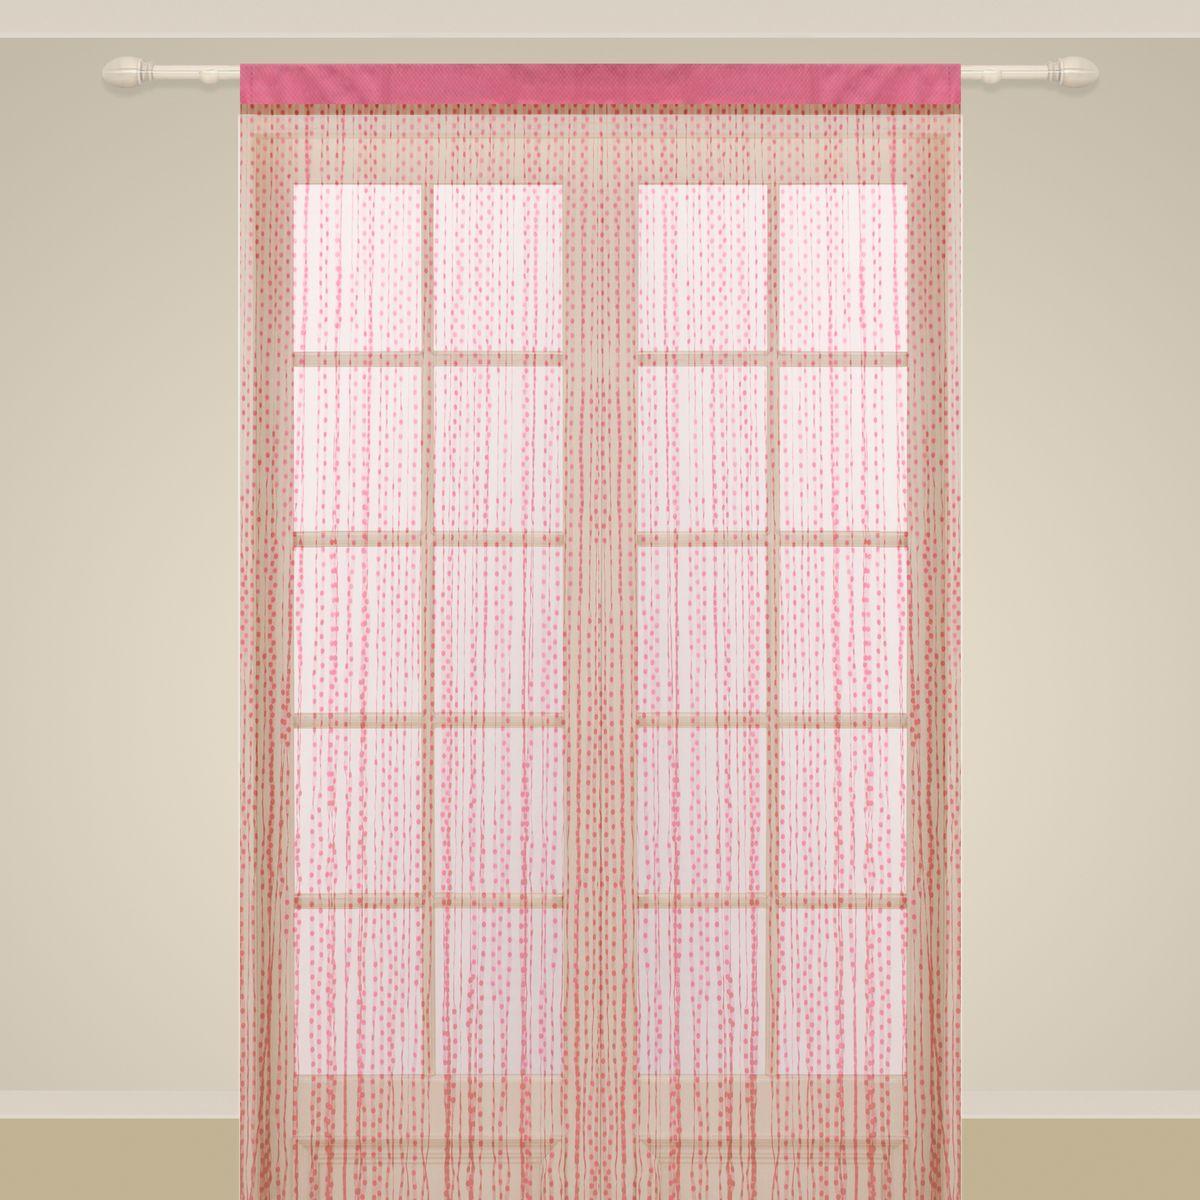 Штора нитяная Sanpa Home Collection, на ленте, цвет: фуксия, высота 290 см. SP112SP12M, FUSHIA, 290*150 см